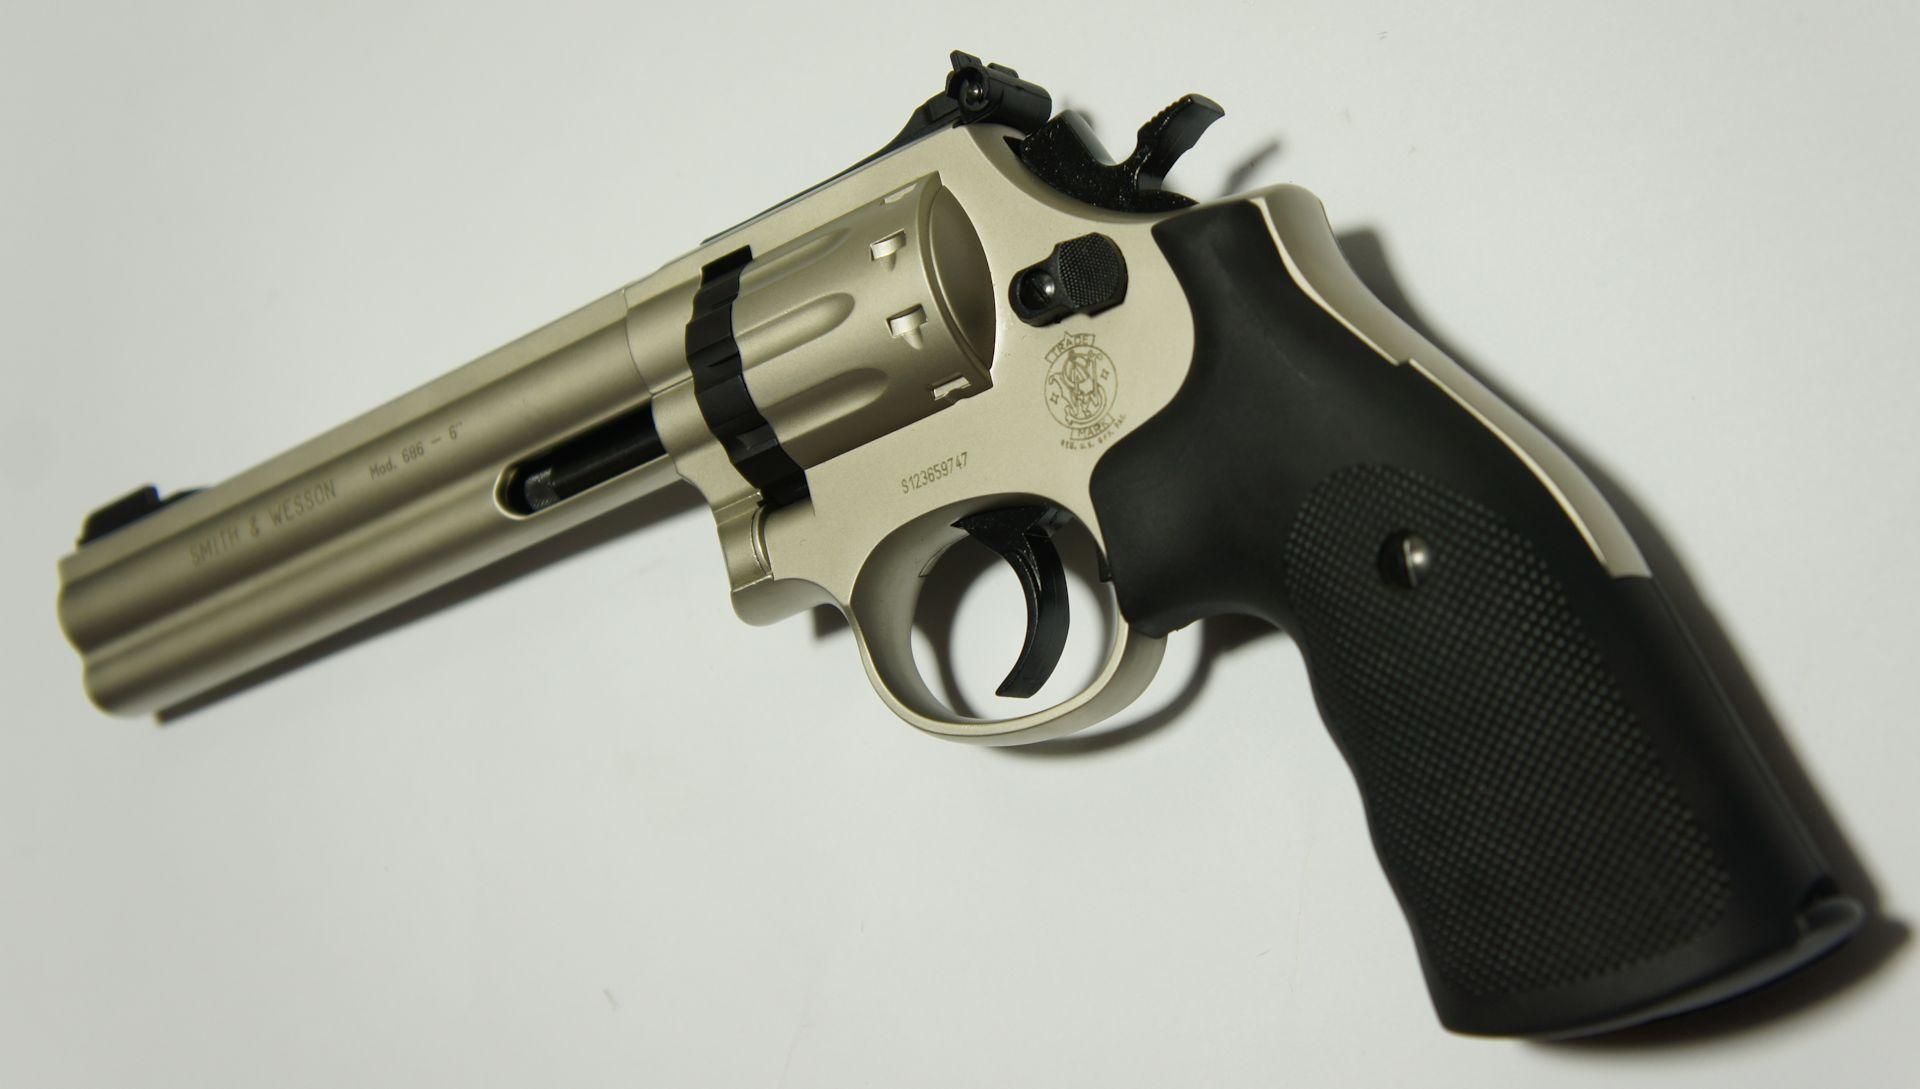 <a href=1050032.htm>So ein CO2 Revolver S&W 686</a> wäre die perfekte Ergänzung